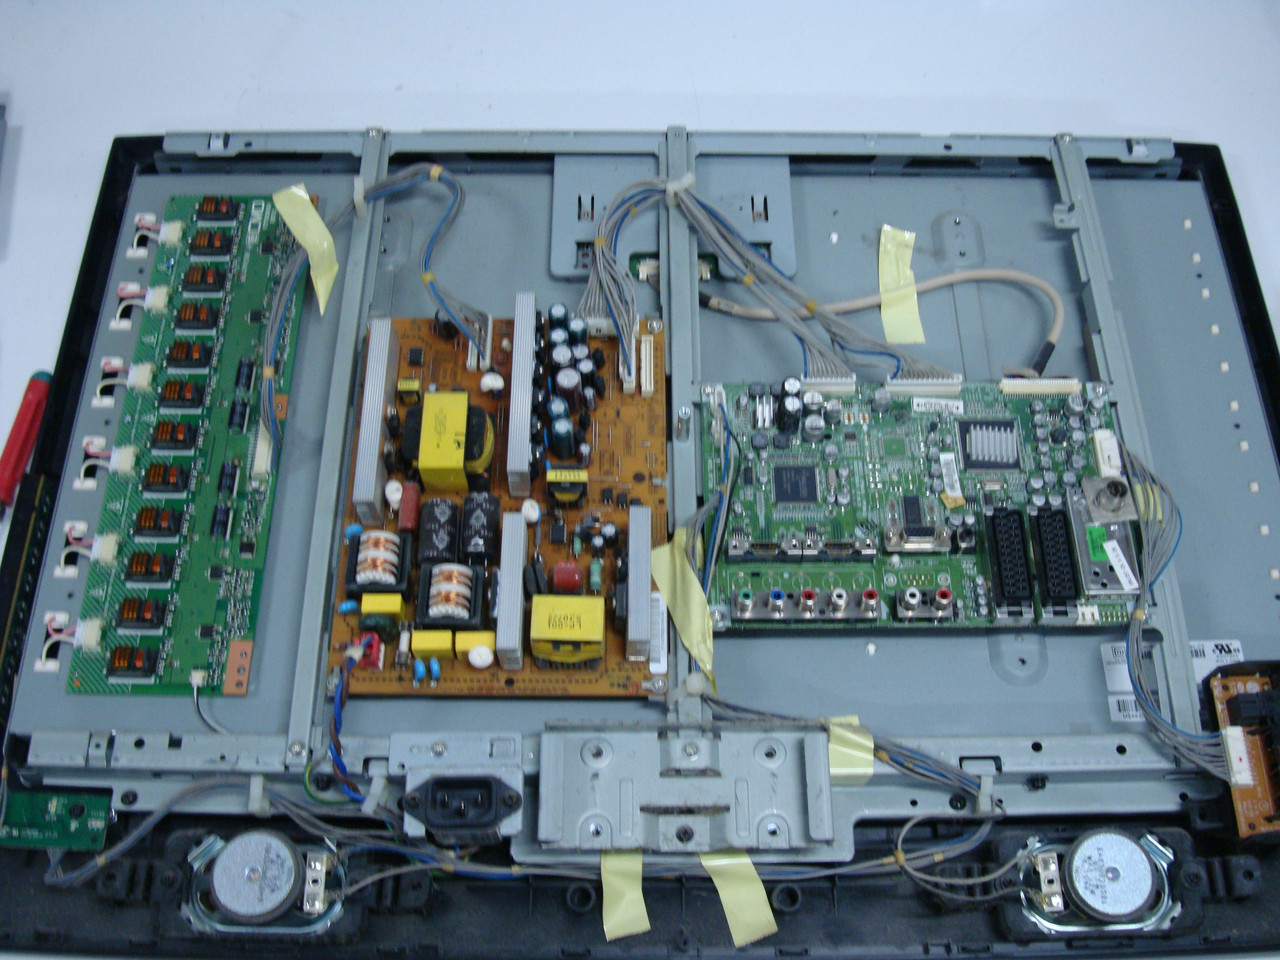 Запчастини до телевізора LG 26LC51 (TCON V260B1-C03, VIT70038.50 REV.3, RCA Eax36298801(1))